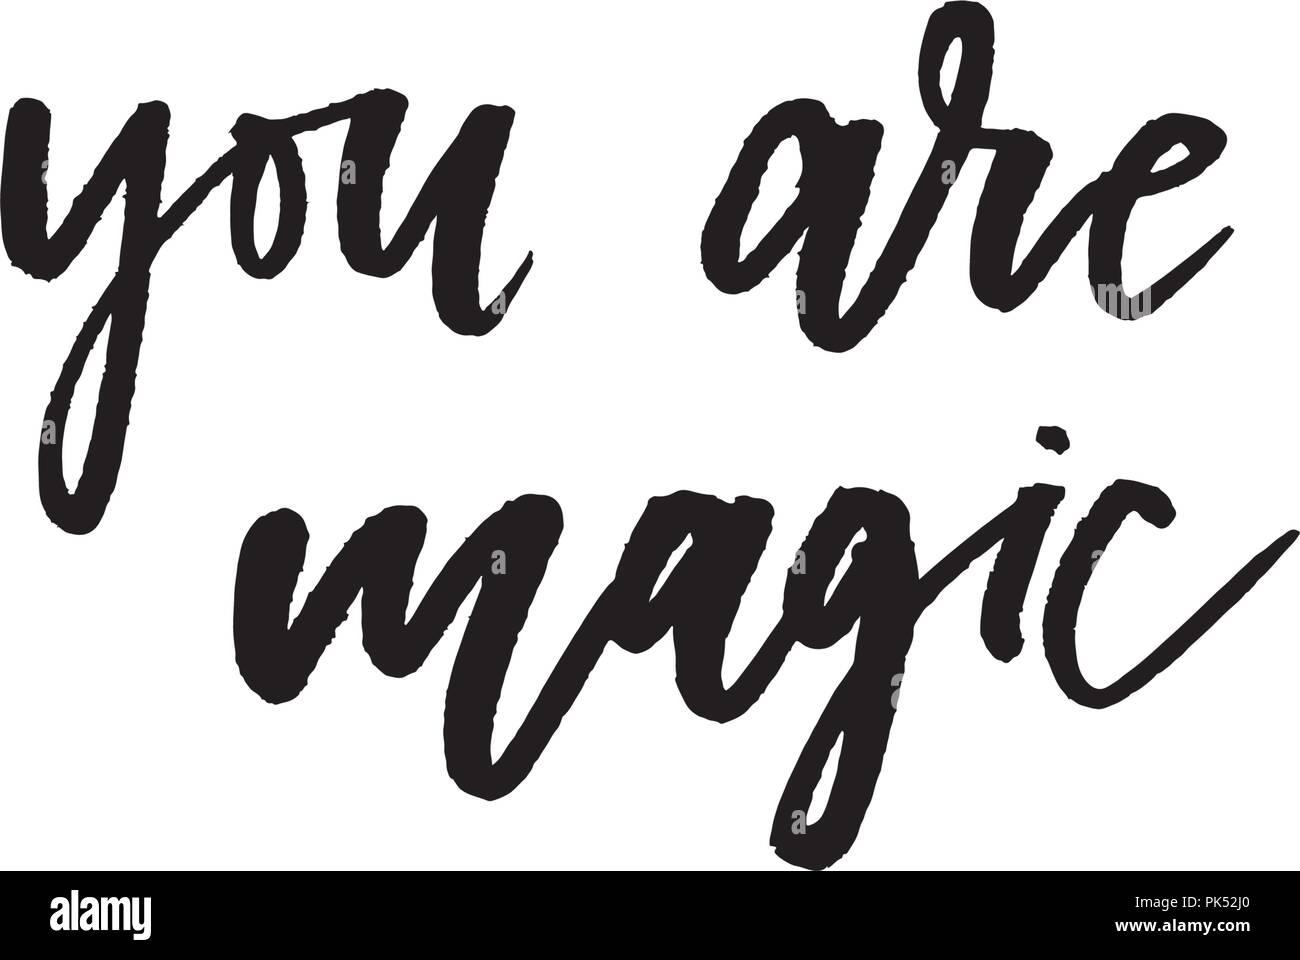 Motto Magic Phrase Grafik vektor Drucken Mode Schriftzug Vektor ...